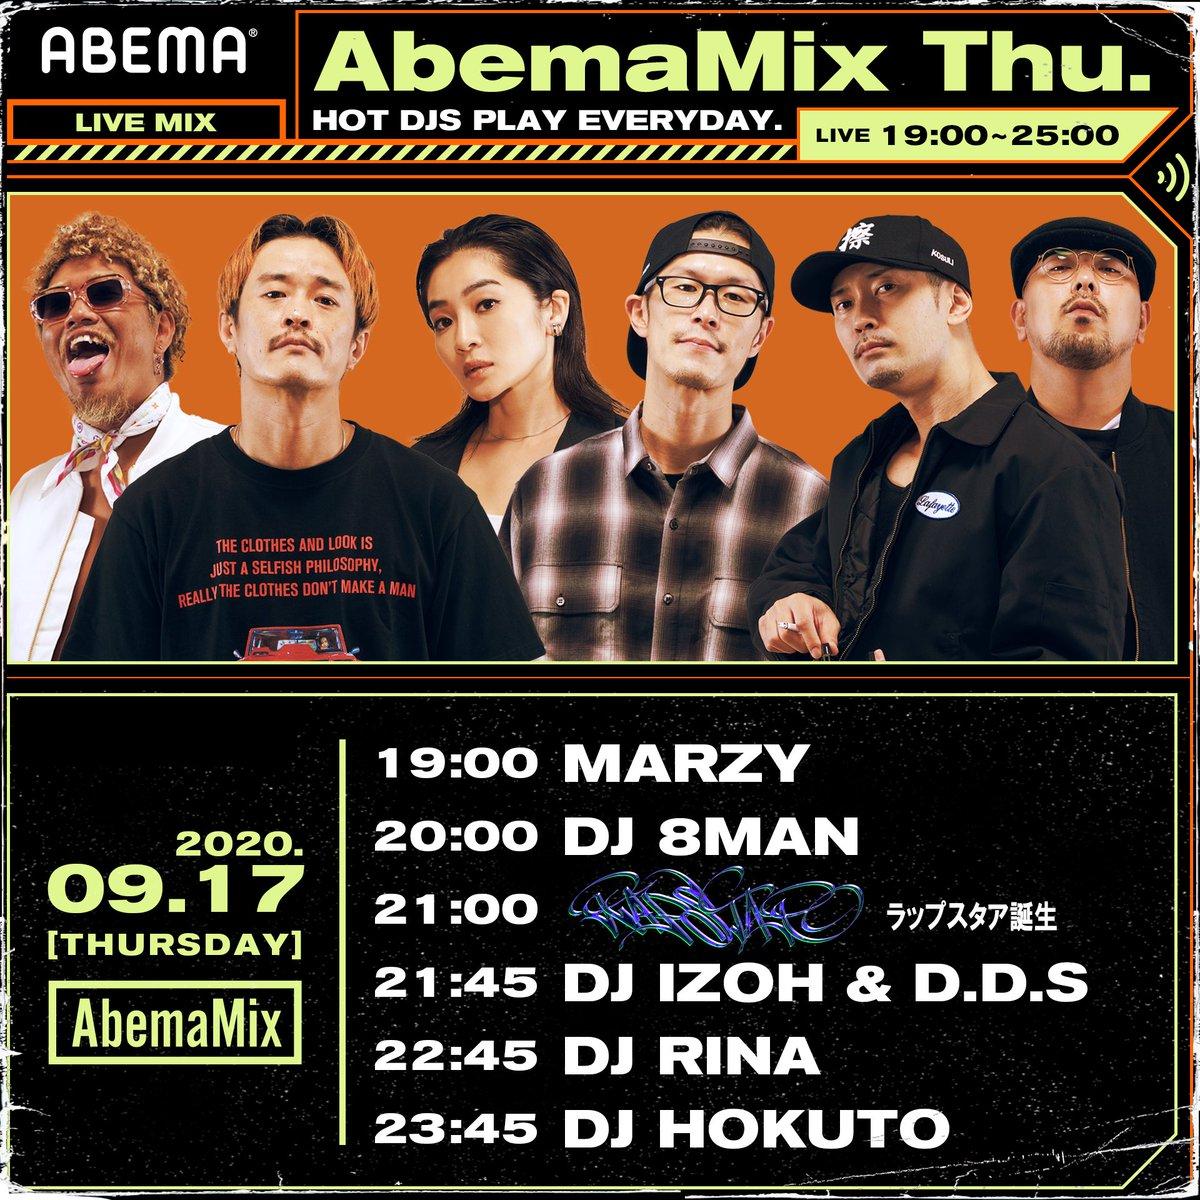 【INFO】 9/17(thu) AbemaMix Thursday @AbemaTV  [DJ] DJ HOKUTO DJ 8MAN DJ RINA MARZY DJ IZOH  [SIDE MC] D.D.S  本日9/17は21:45〜22:45にDJ IZOHのSIDE MCとして登場!! https://t.co/i9N1DF7fkr https://t.co/I5zQ3i17Cy